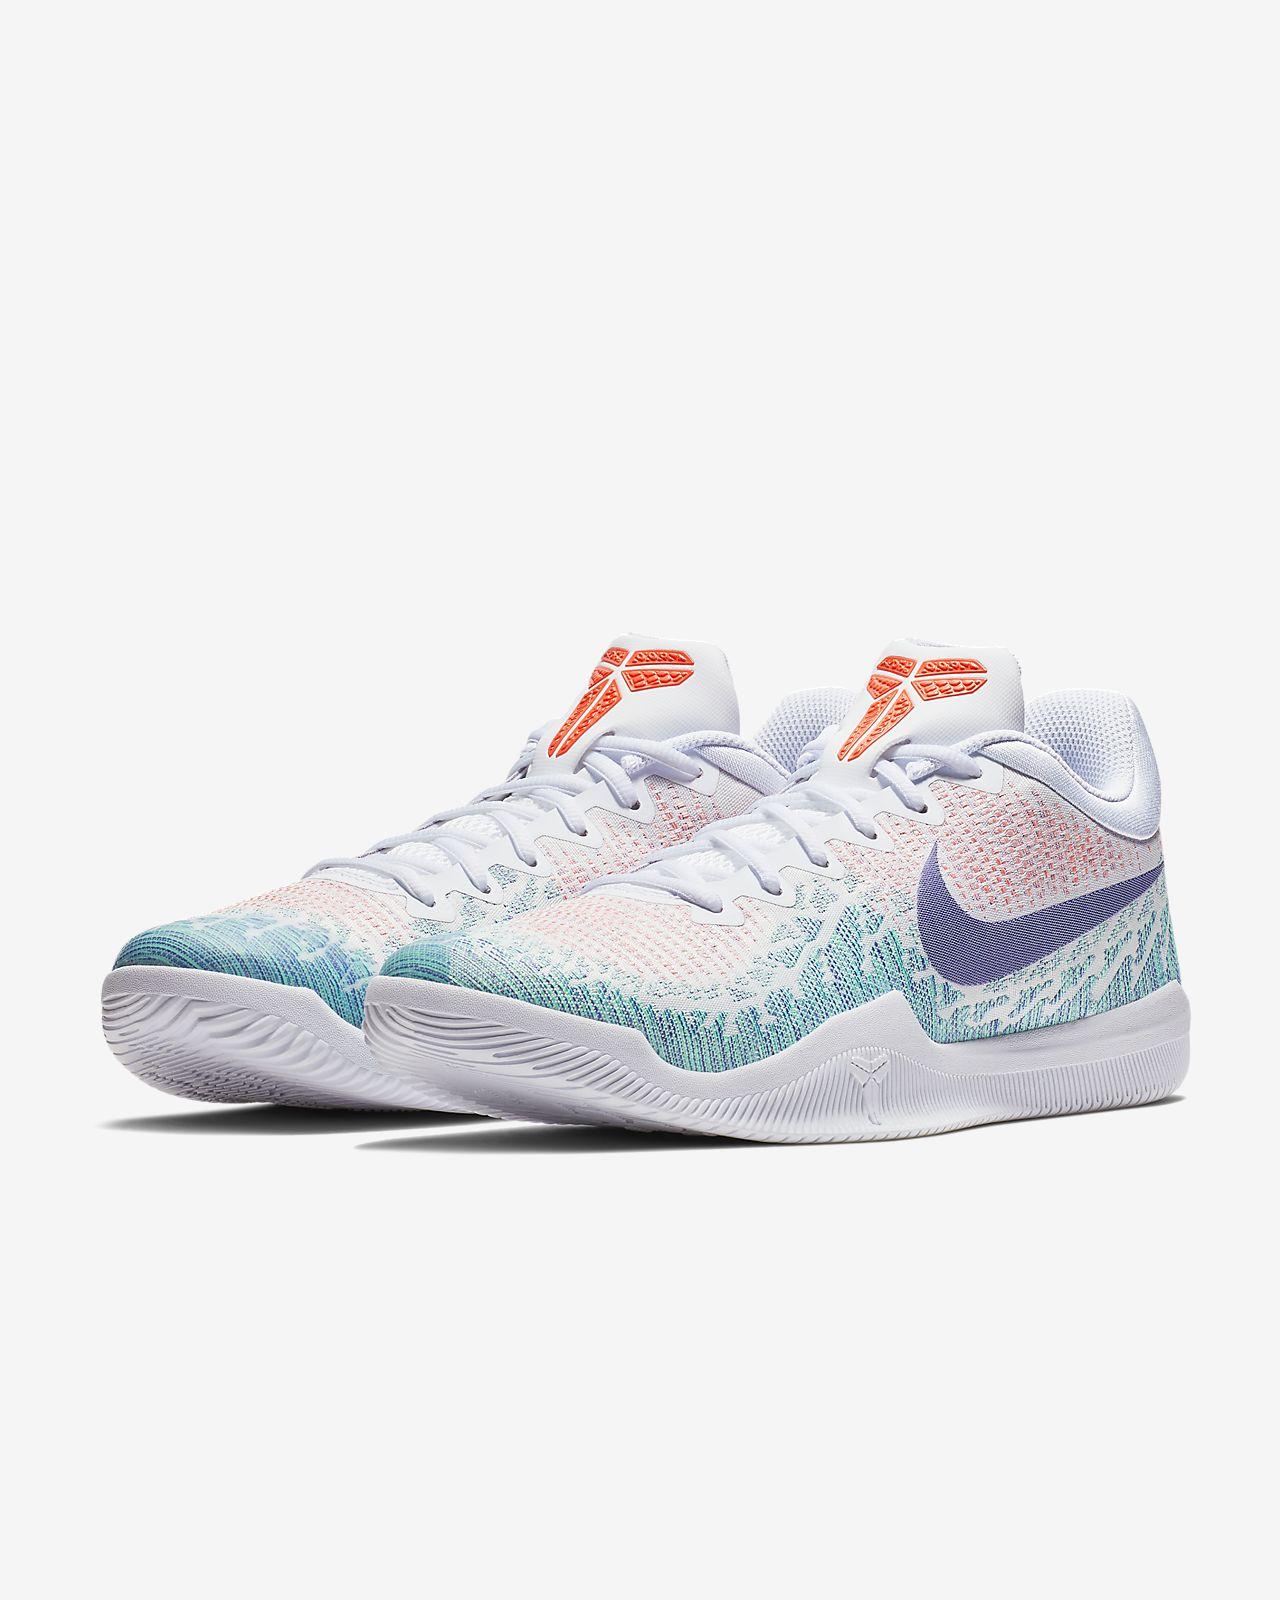 9d7fc73bf38e Nike Mamba Rage Men s Basketball Shoe. Nike.com SG